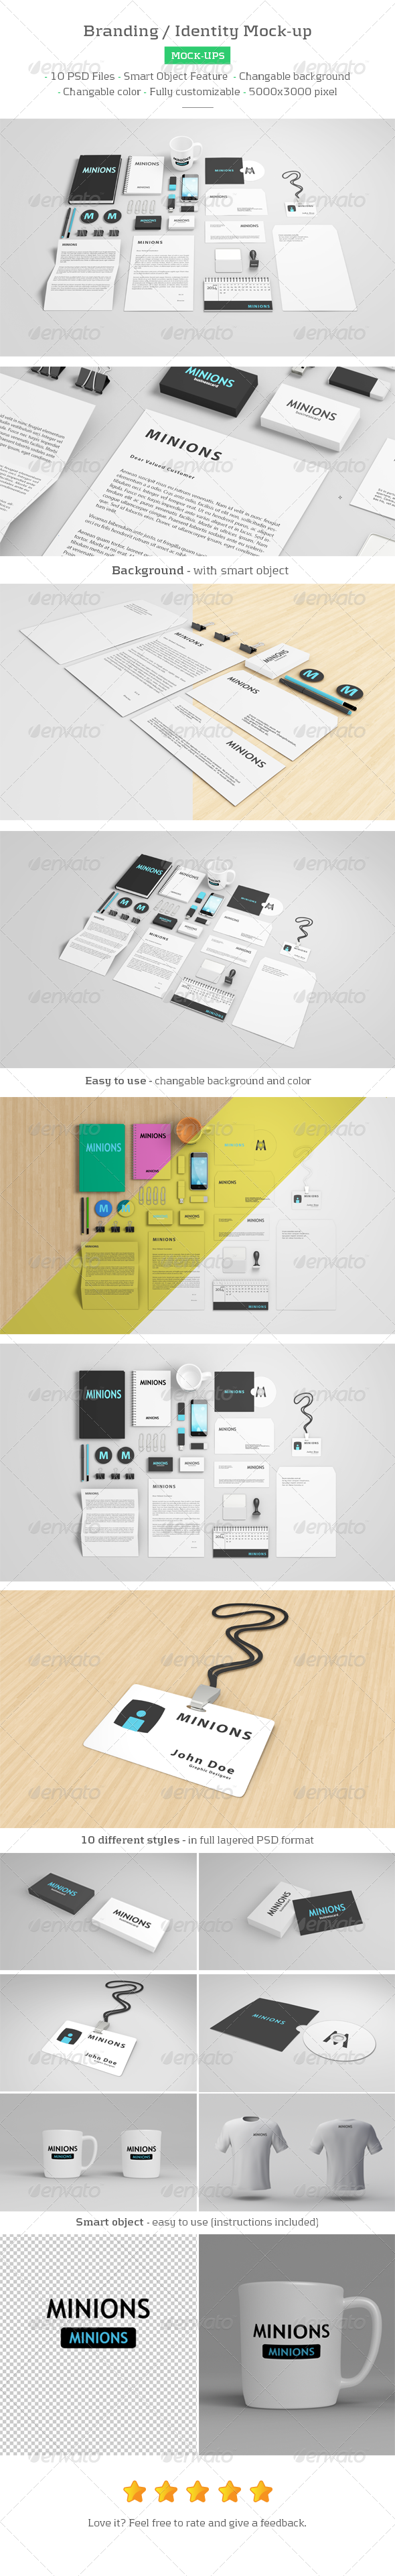 GraphicRiver Branding Identity Mockup 8207888